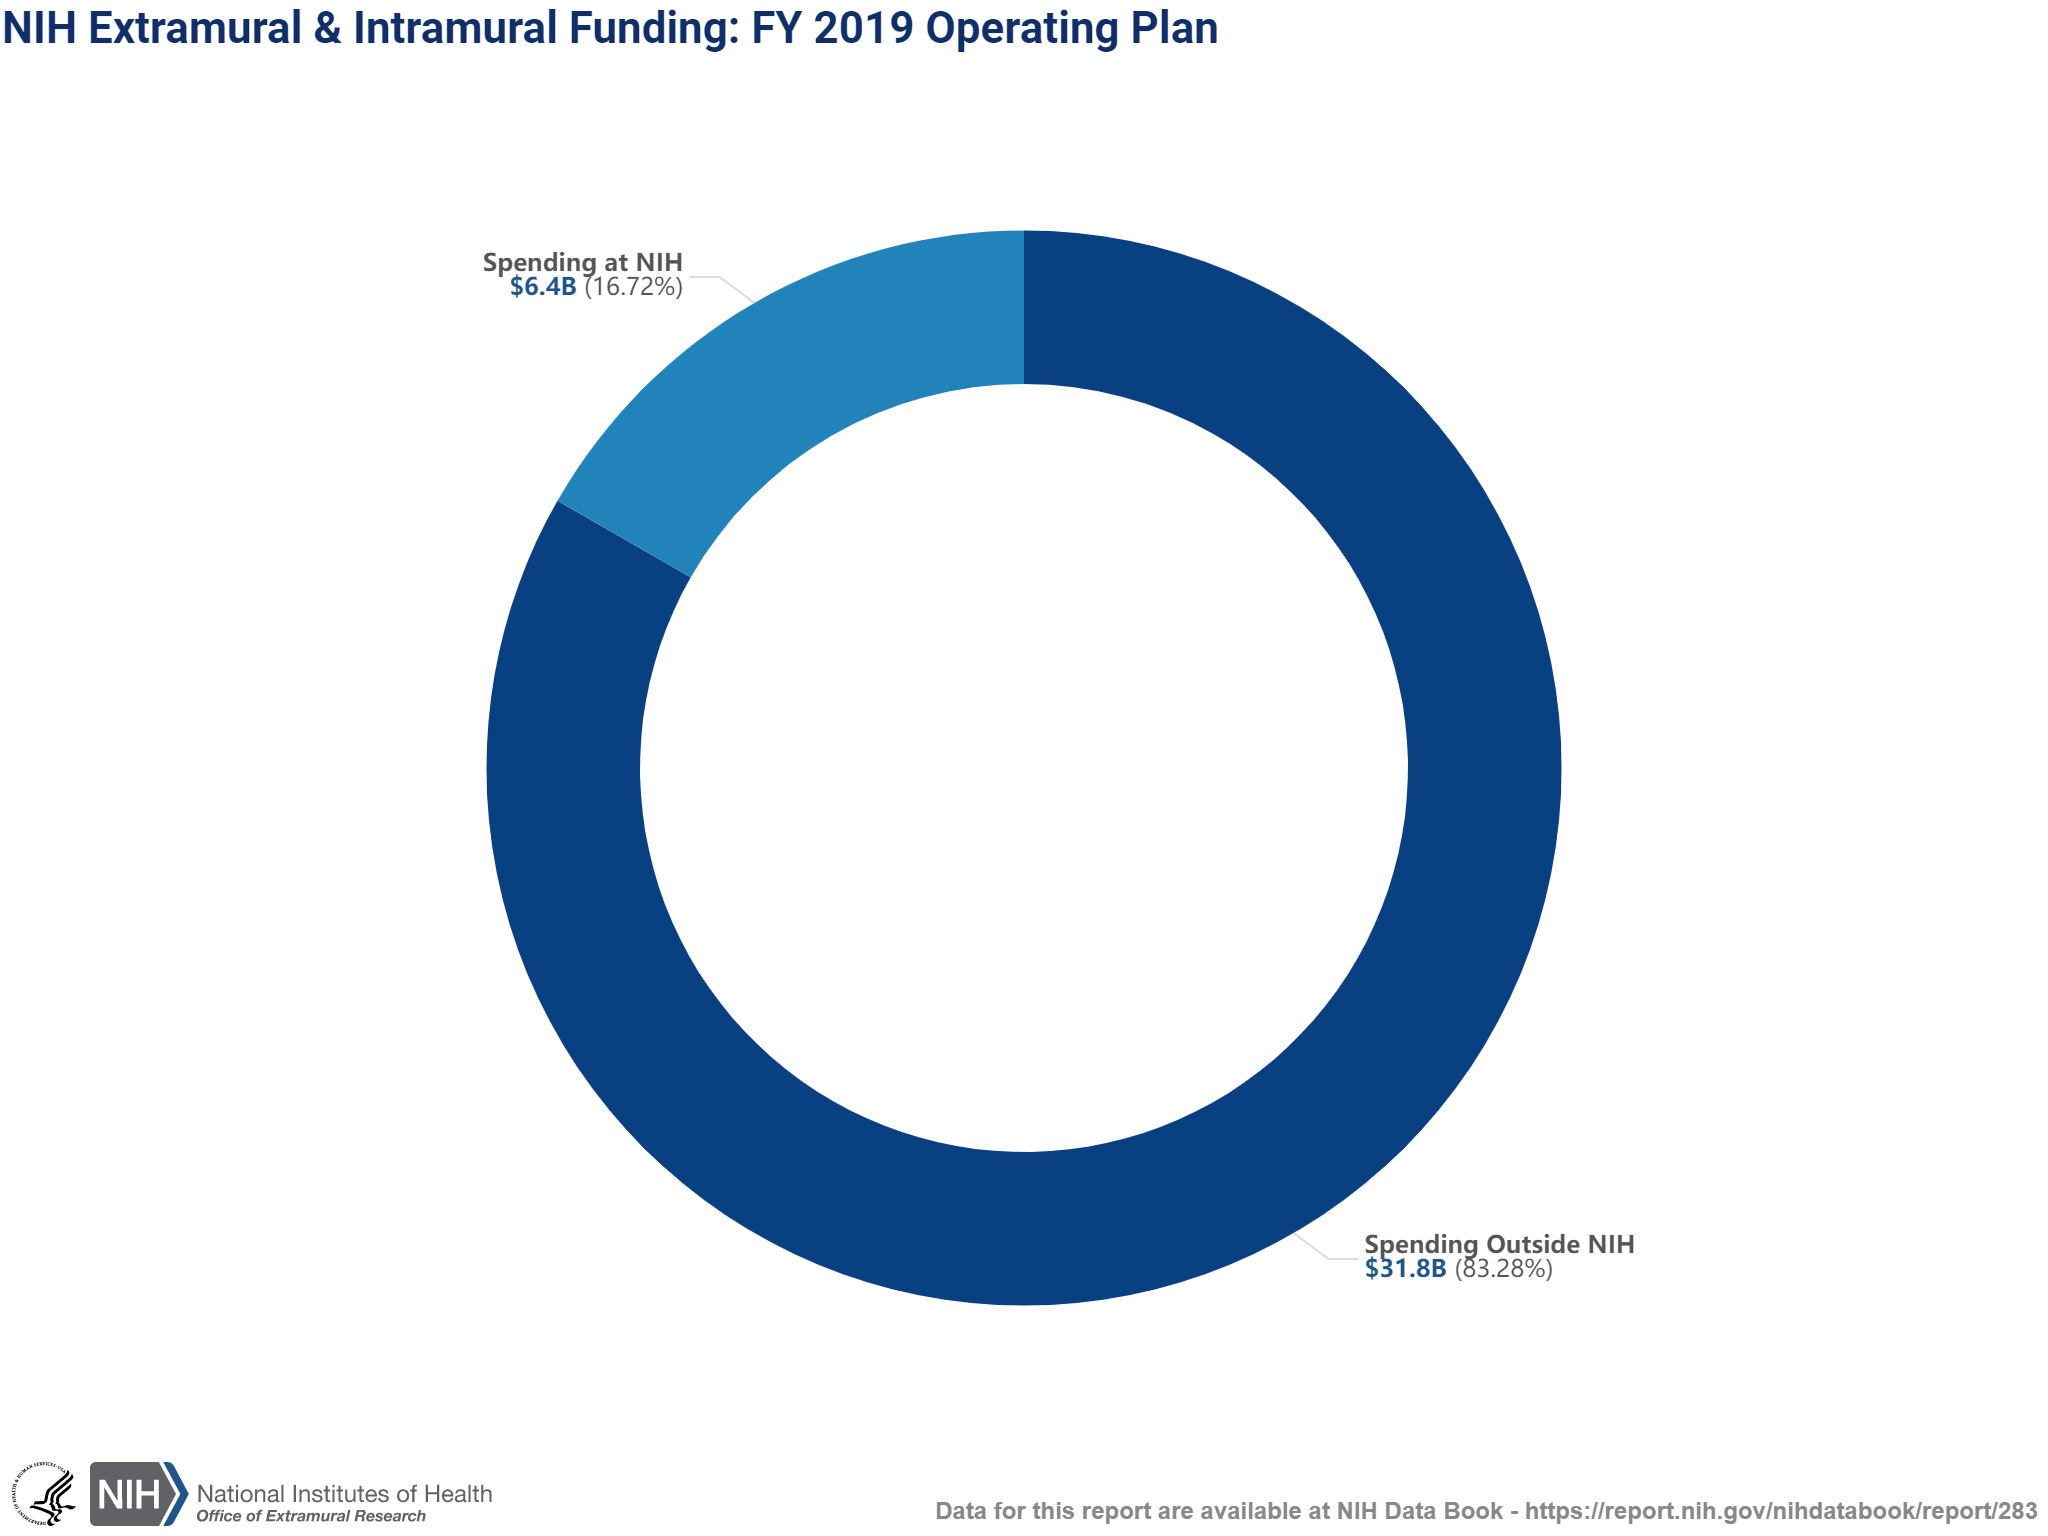 Percentage of NIH's FY 2019 budget for extramural research funding versus spending at NIH.